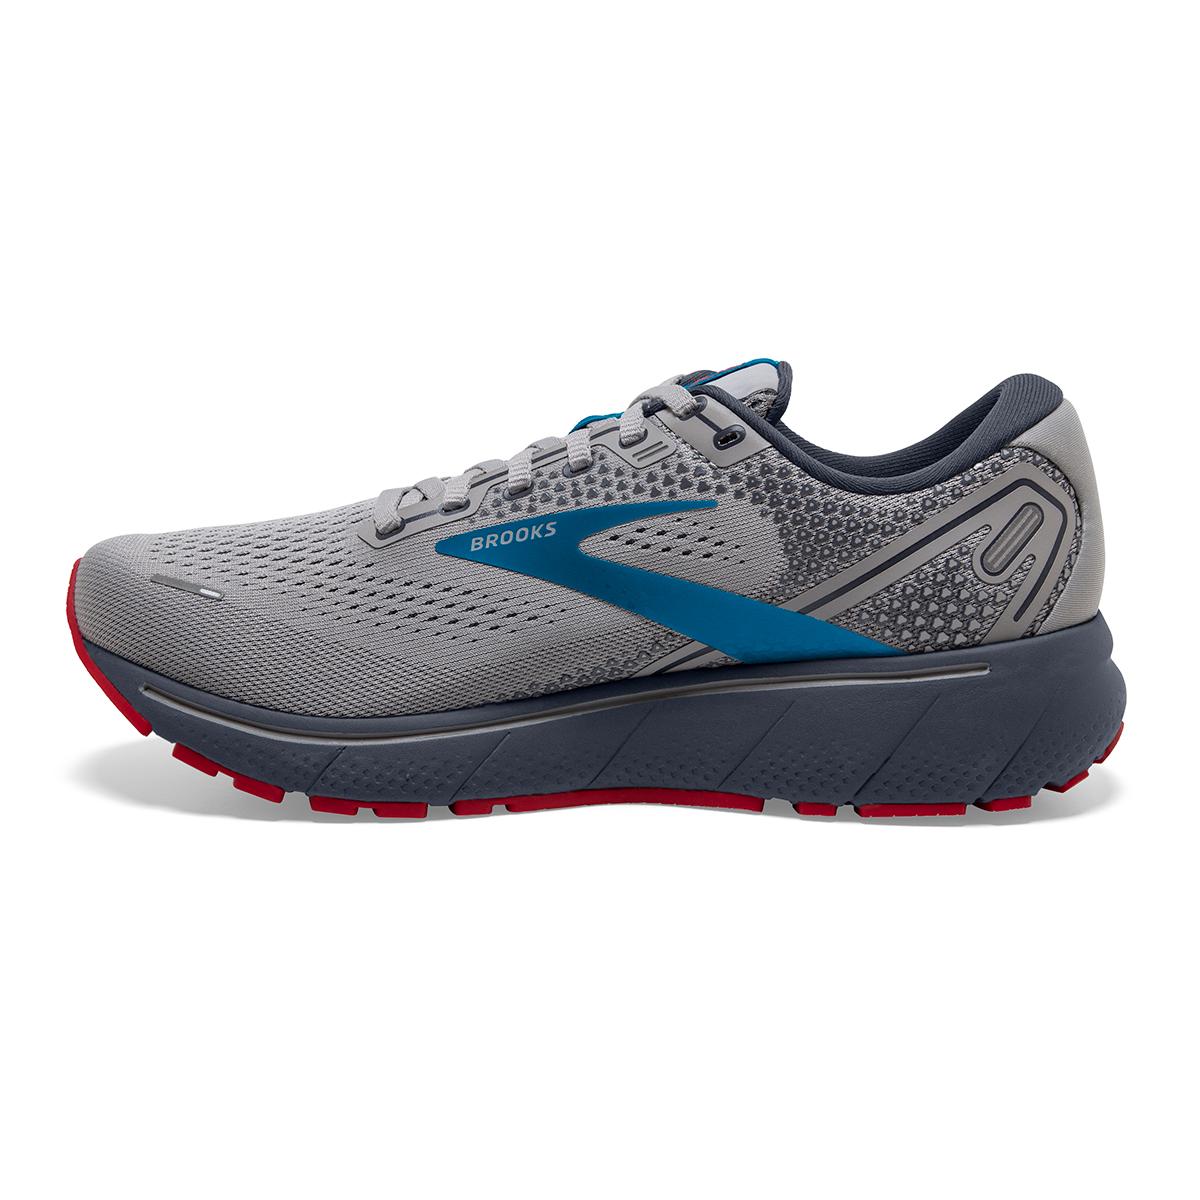 Men's Brooks Ghost 14 Running Shoe - Color: Grey/Blue/Red - Size: 7 - Width: Regular, Grey/Blue/Red, large, image 2